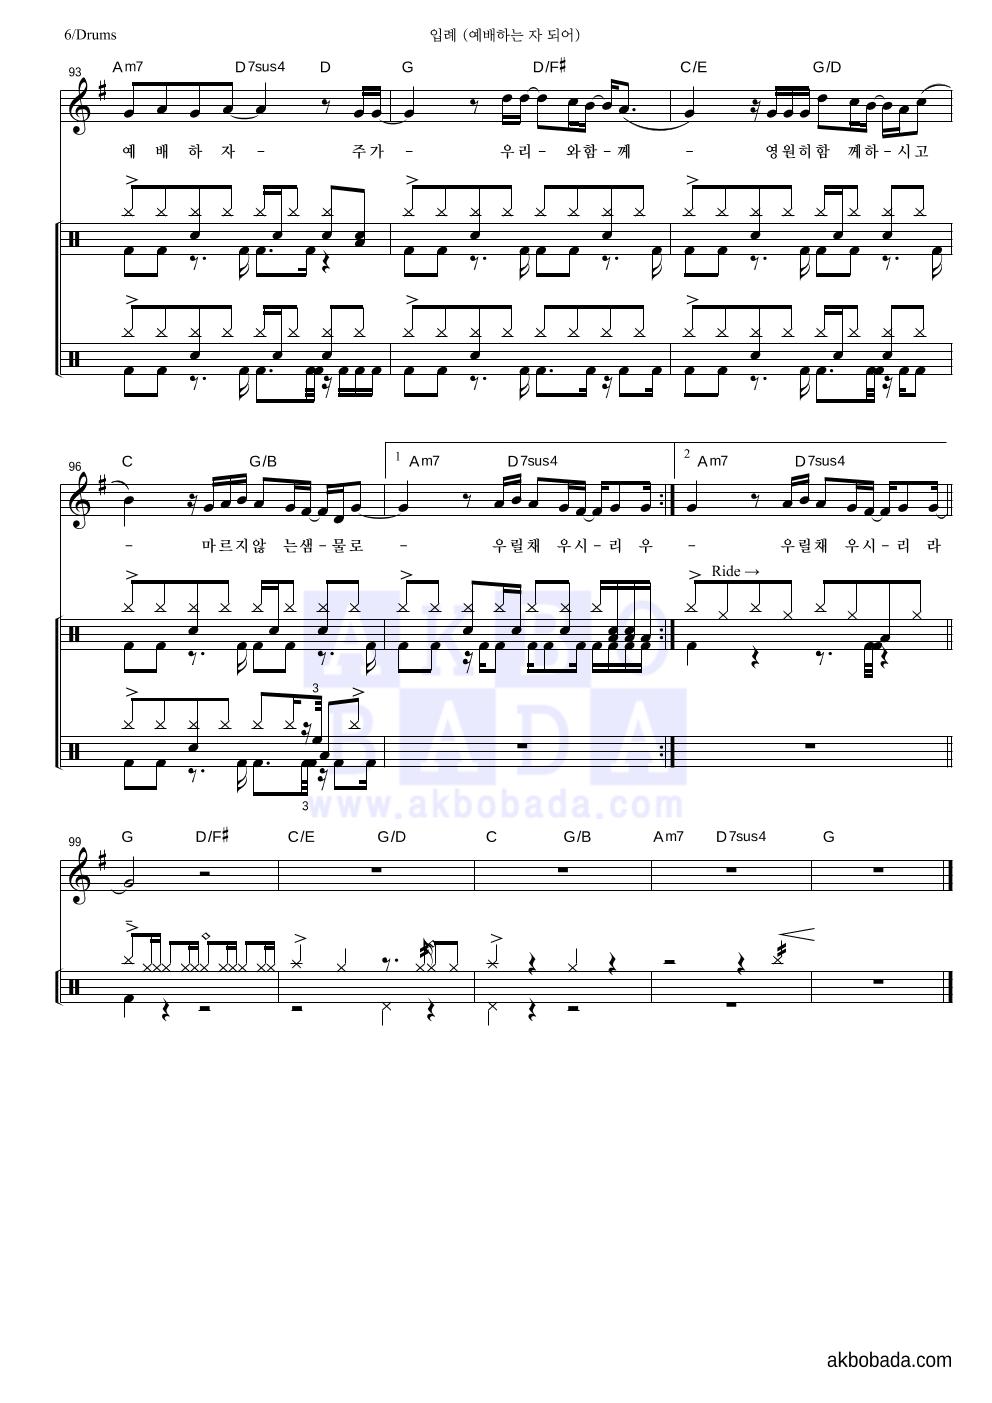 WeLove - 입례 (예배하는 자 되어) 드럼 악보